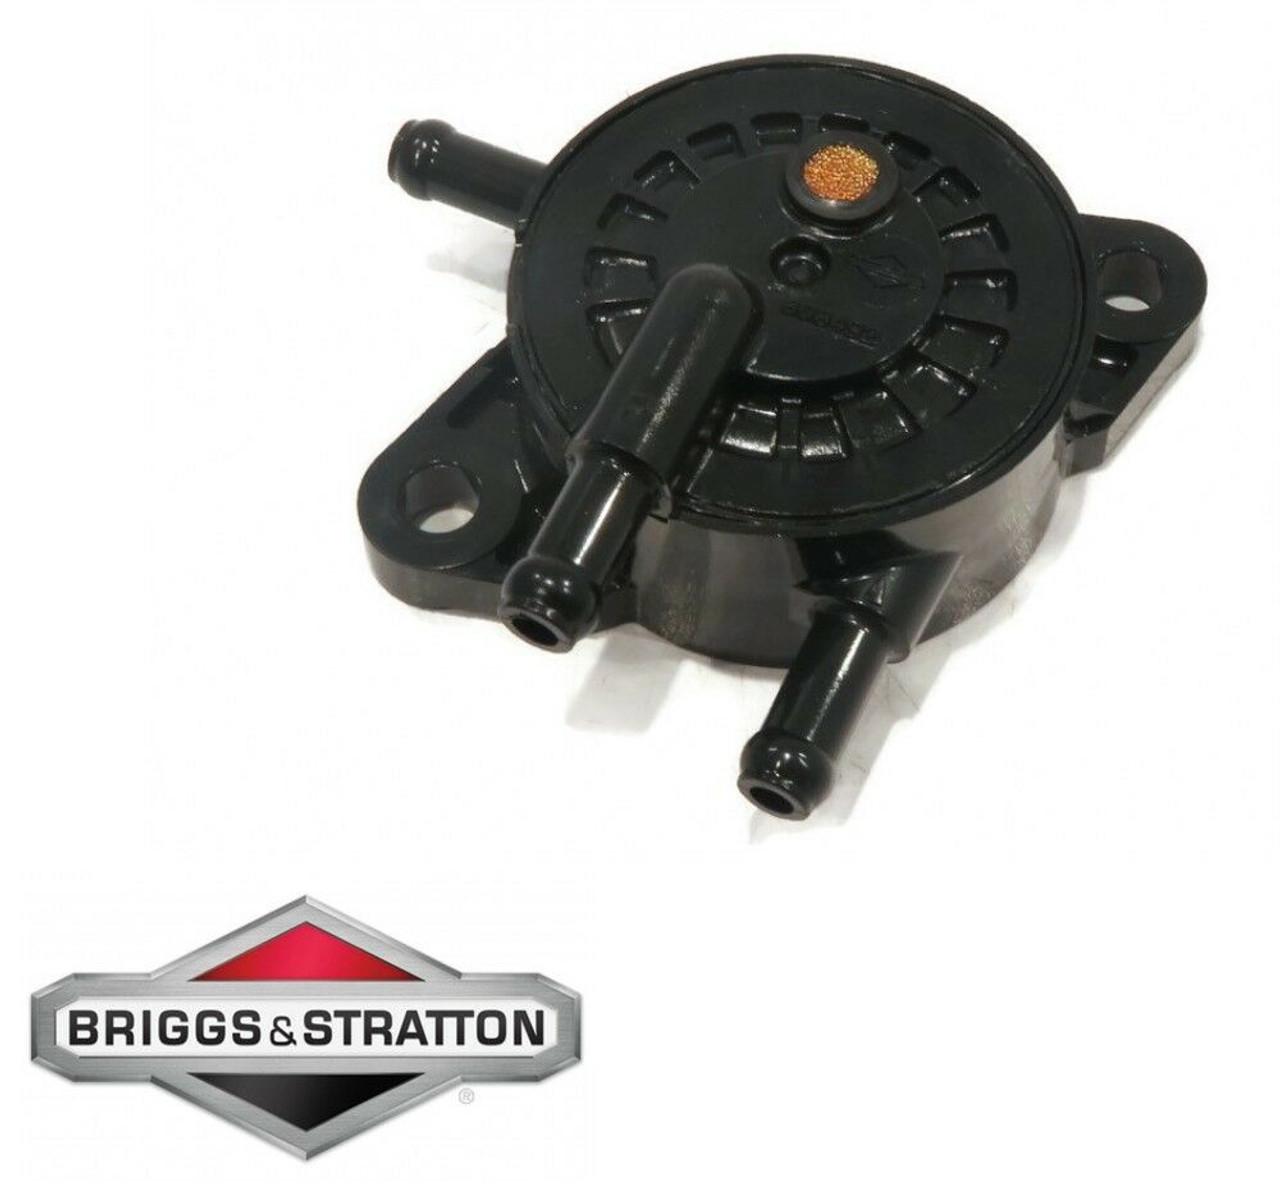 Briggs & Stratton NEW OEM Fuel Pump PT# 597338